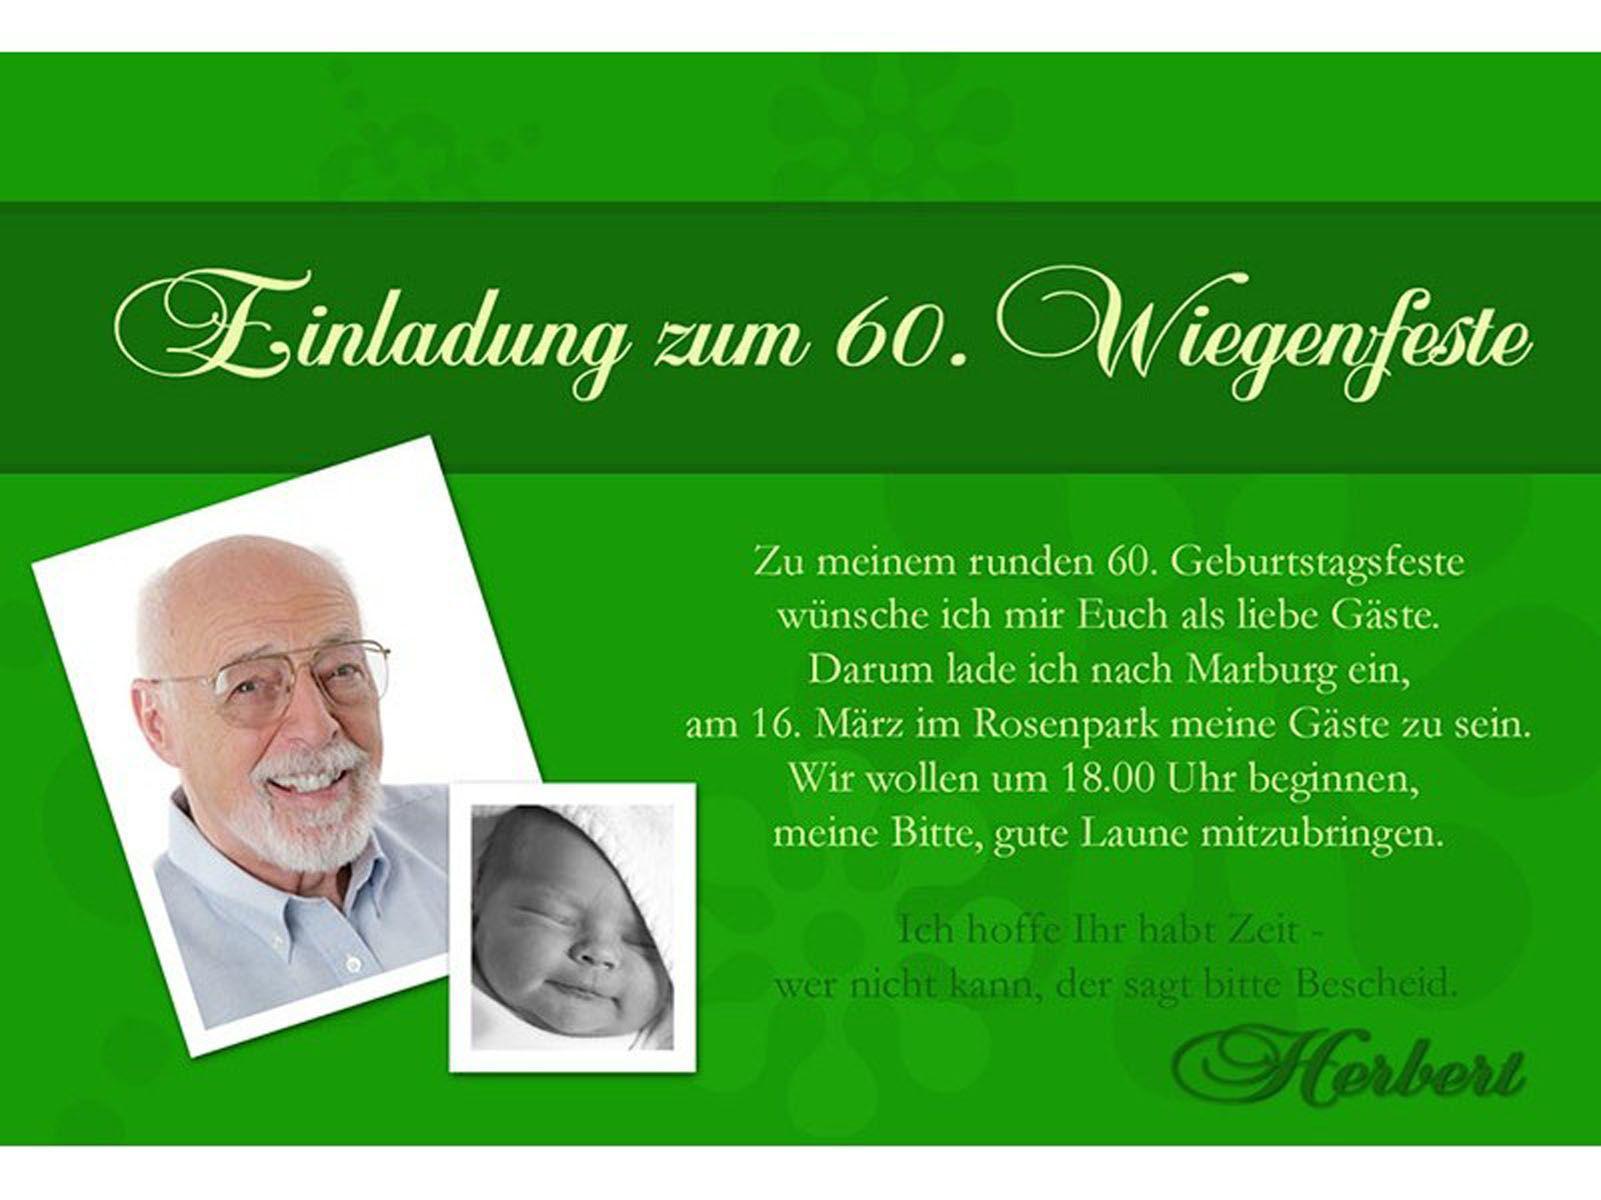 Einladung Geburtstag : Einladung Geburtstag Whatsapp - Geburstag Einladungskarten - Geburstag ...